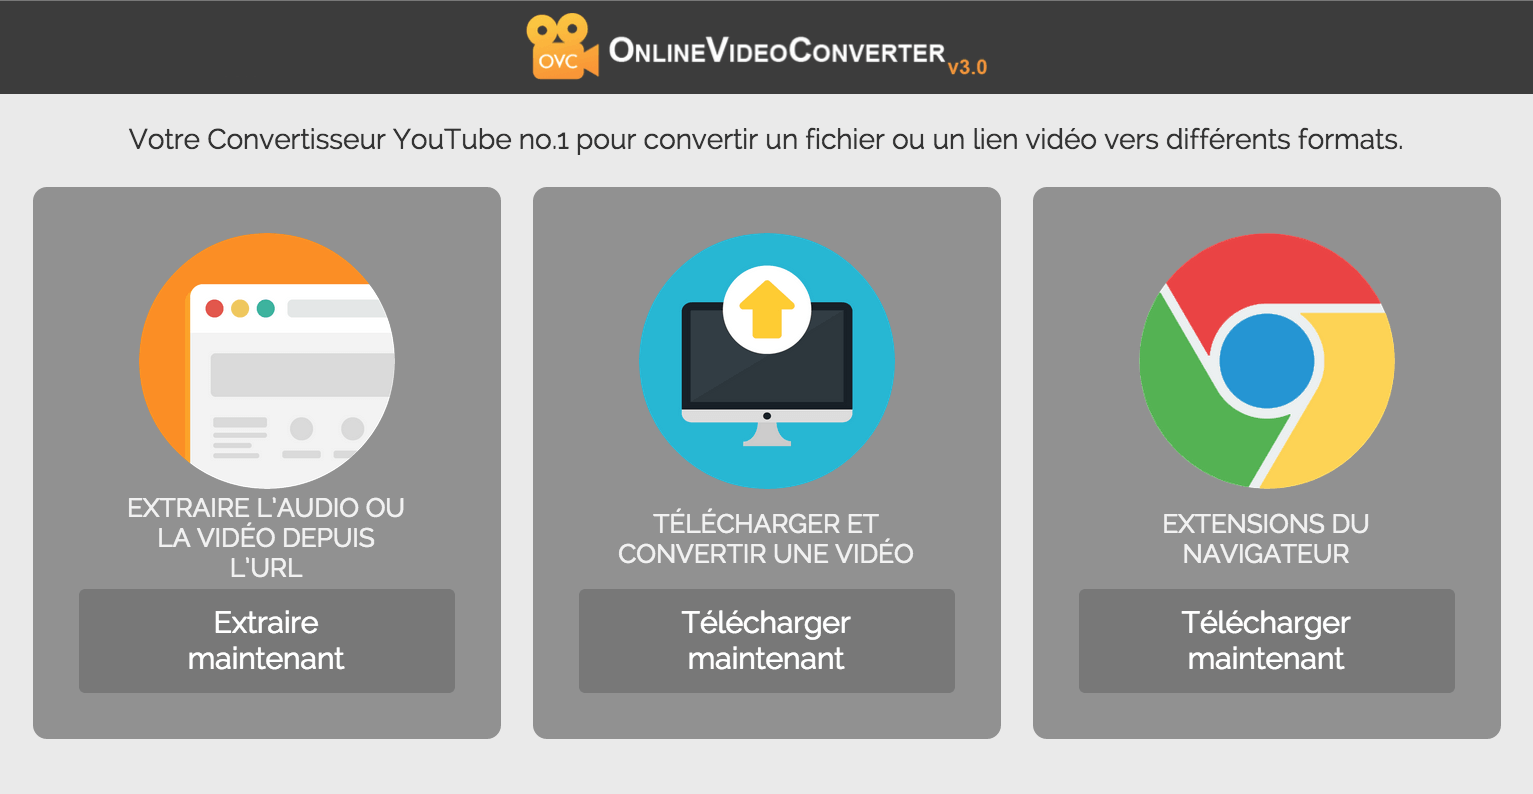 Convertissez Des Videos Youtube En Mp3 Mp4 Avi Convertisseur Video Gratuit N 1 Free Video Converter Video Converter Free Online Videos